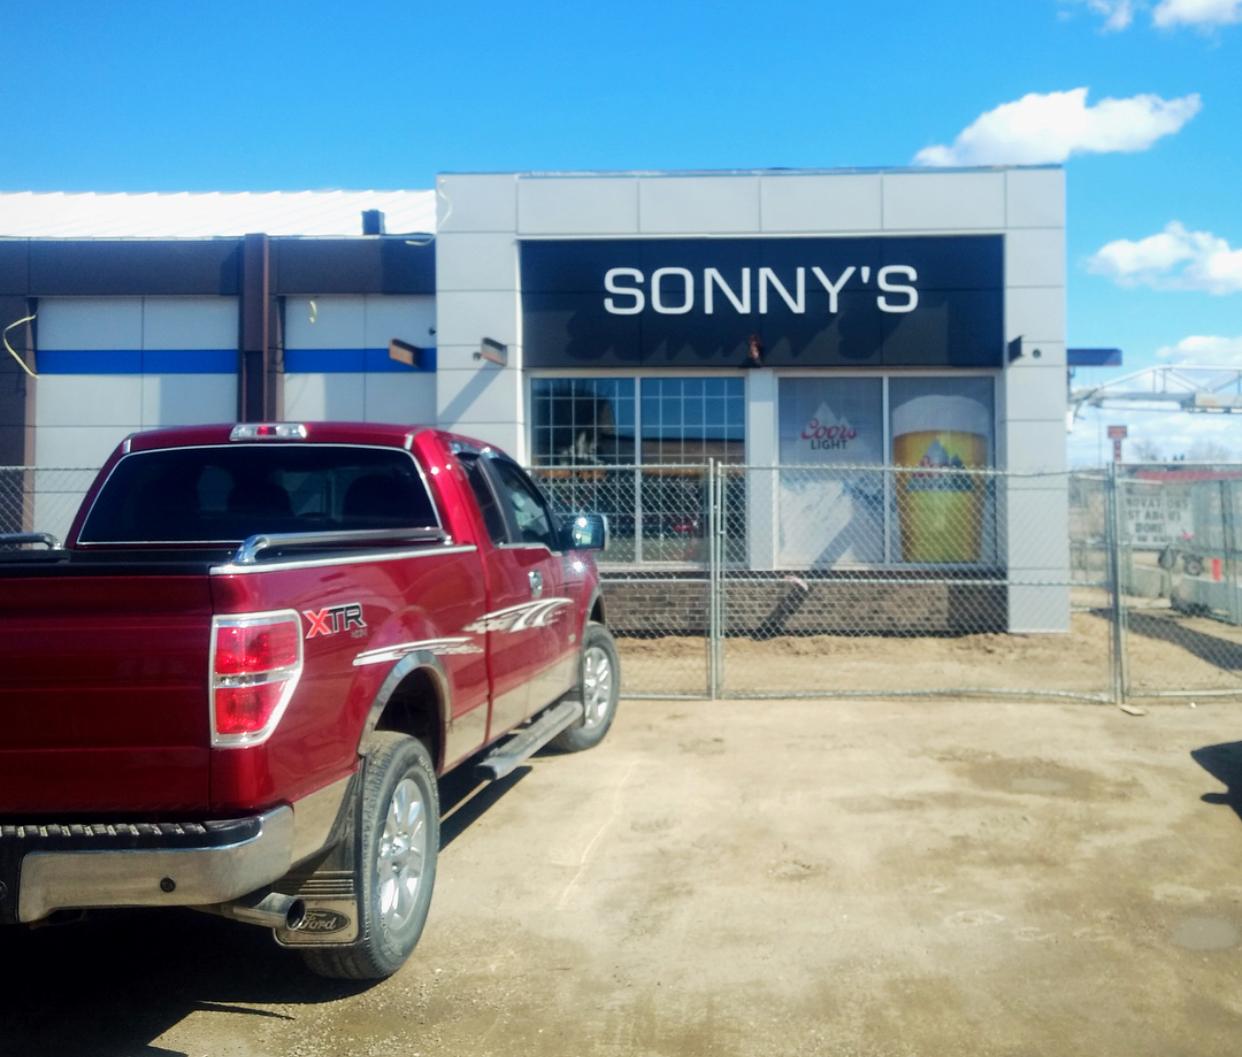 SonnysLiquor_Alberta_Signs